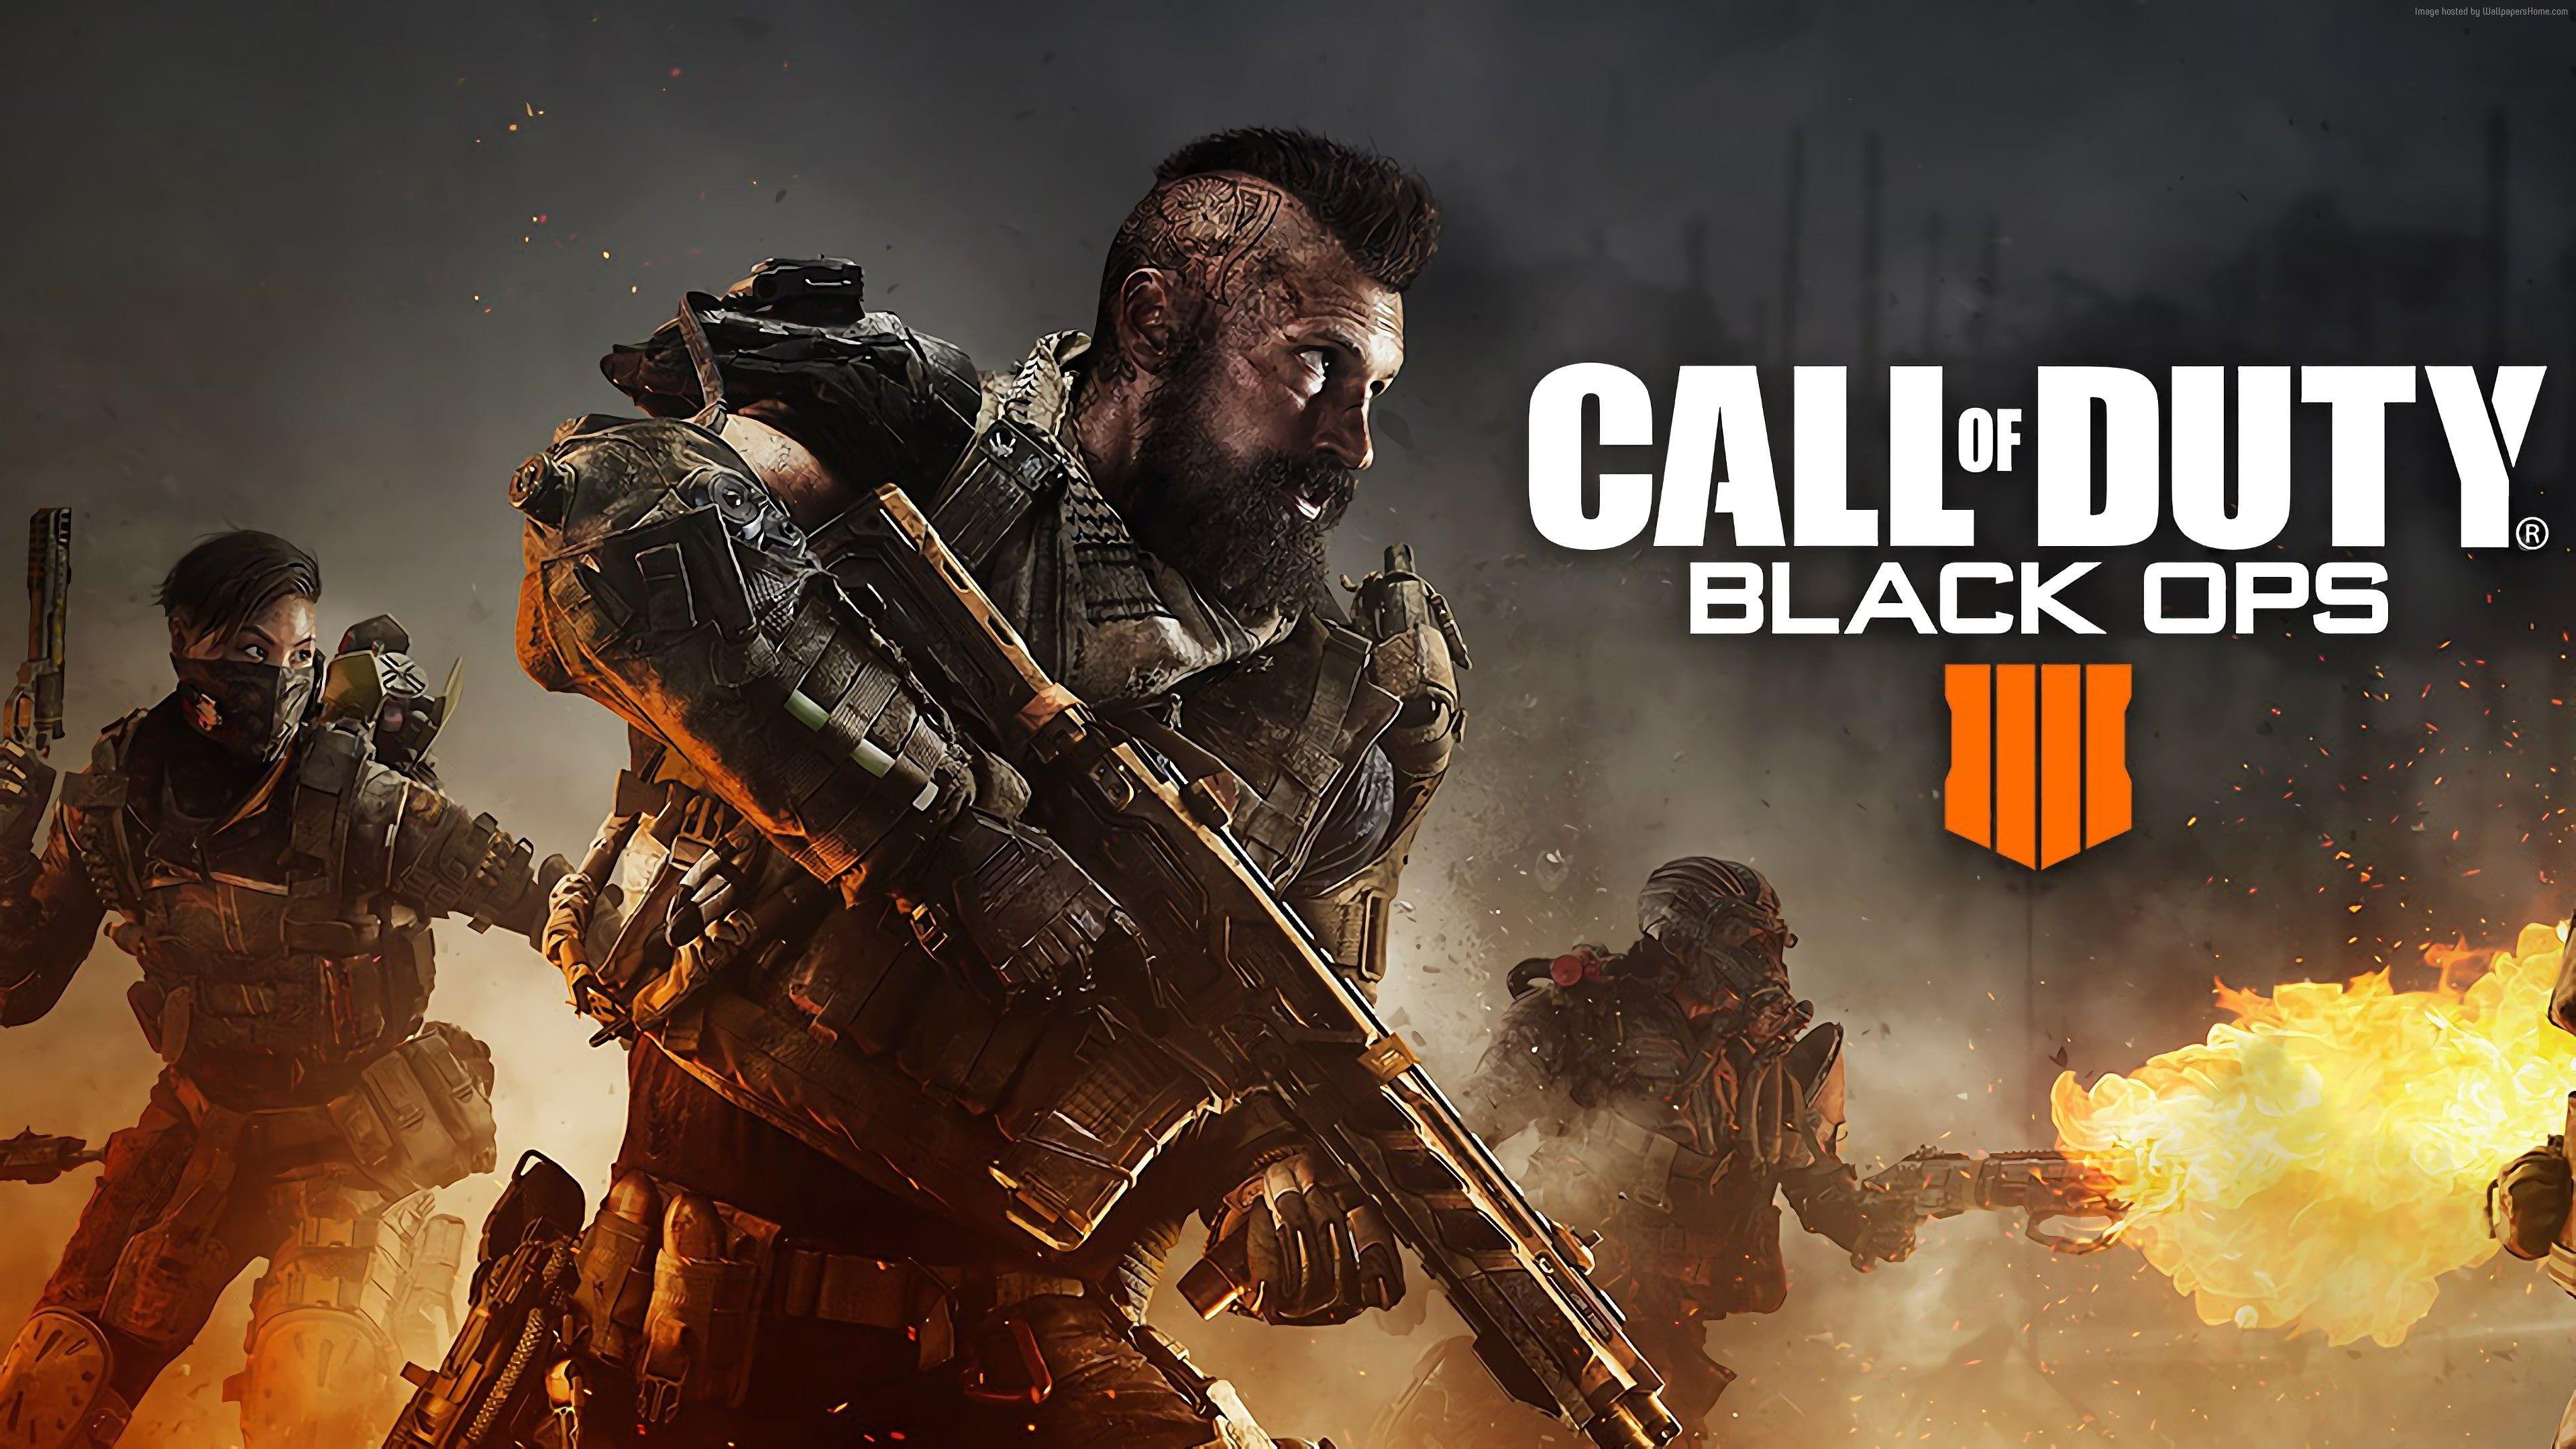 4k Call Of Duty Black Ops 4 Poster 4k Wallpaper Hdwallpaper Desktop In 2021 Call Of Duty Black Hd Wallpaper 4k Iphone Wallpaper New Hd